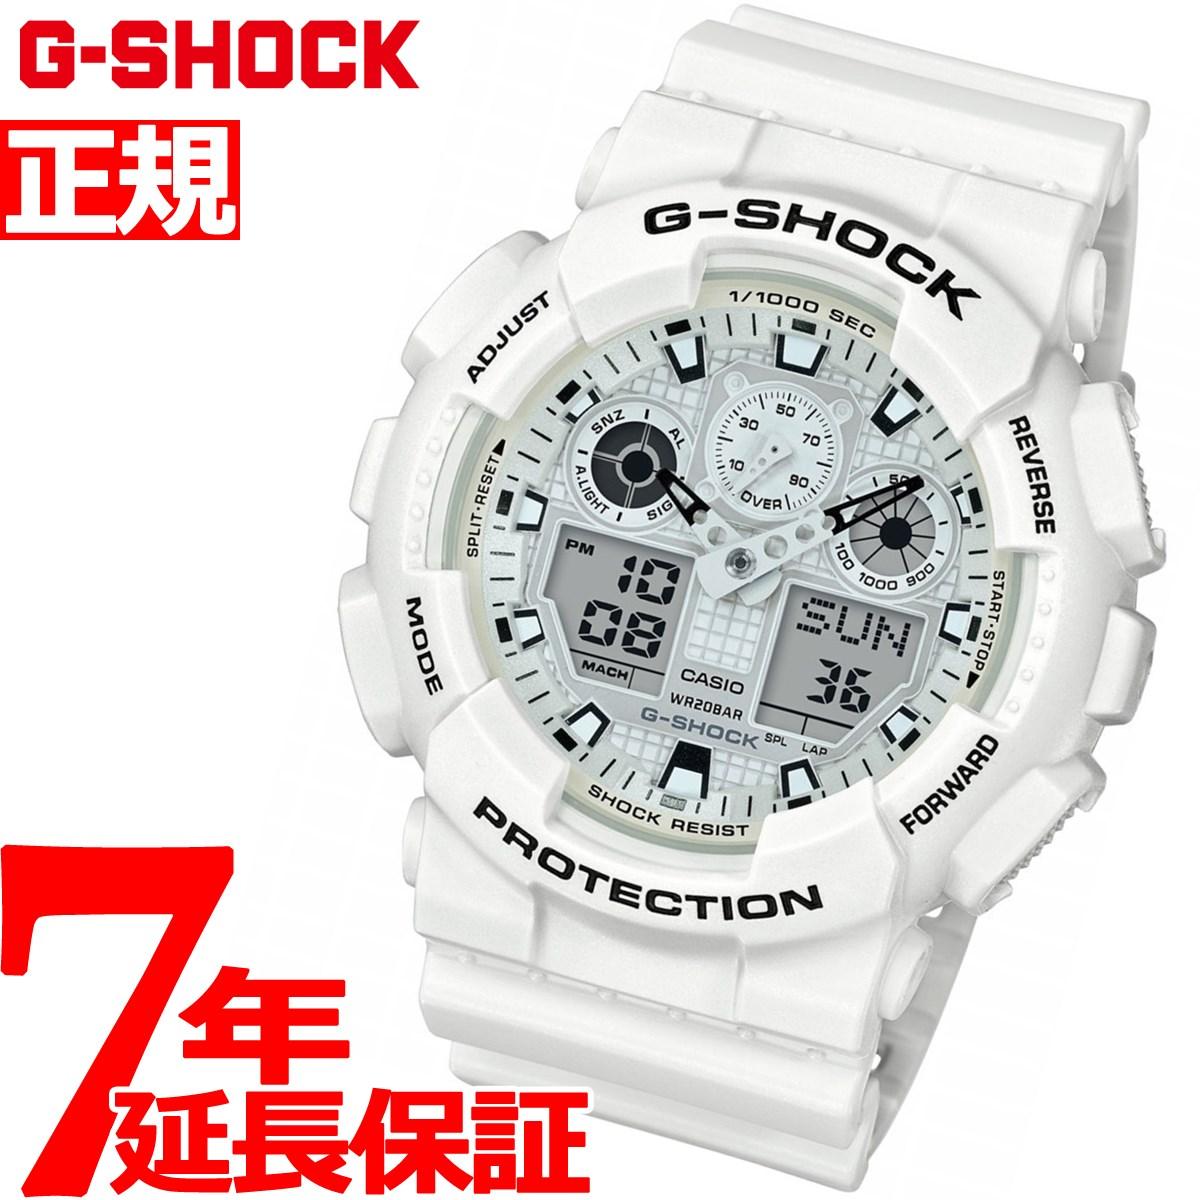 G-SHOCK アナデジ メンズ 腕時計 マリンホワイト 白 Marine White CASIO GA-100MW-7AJF【2018 新作】